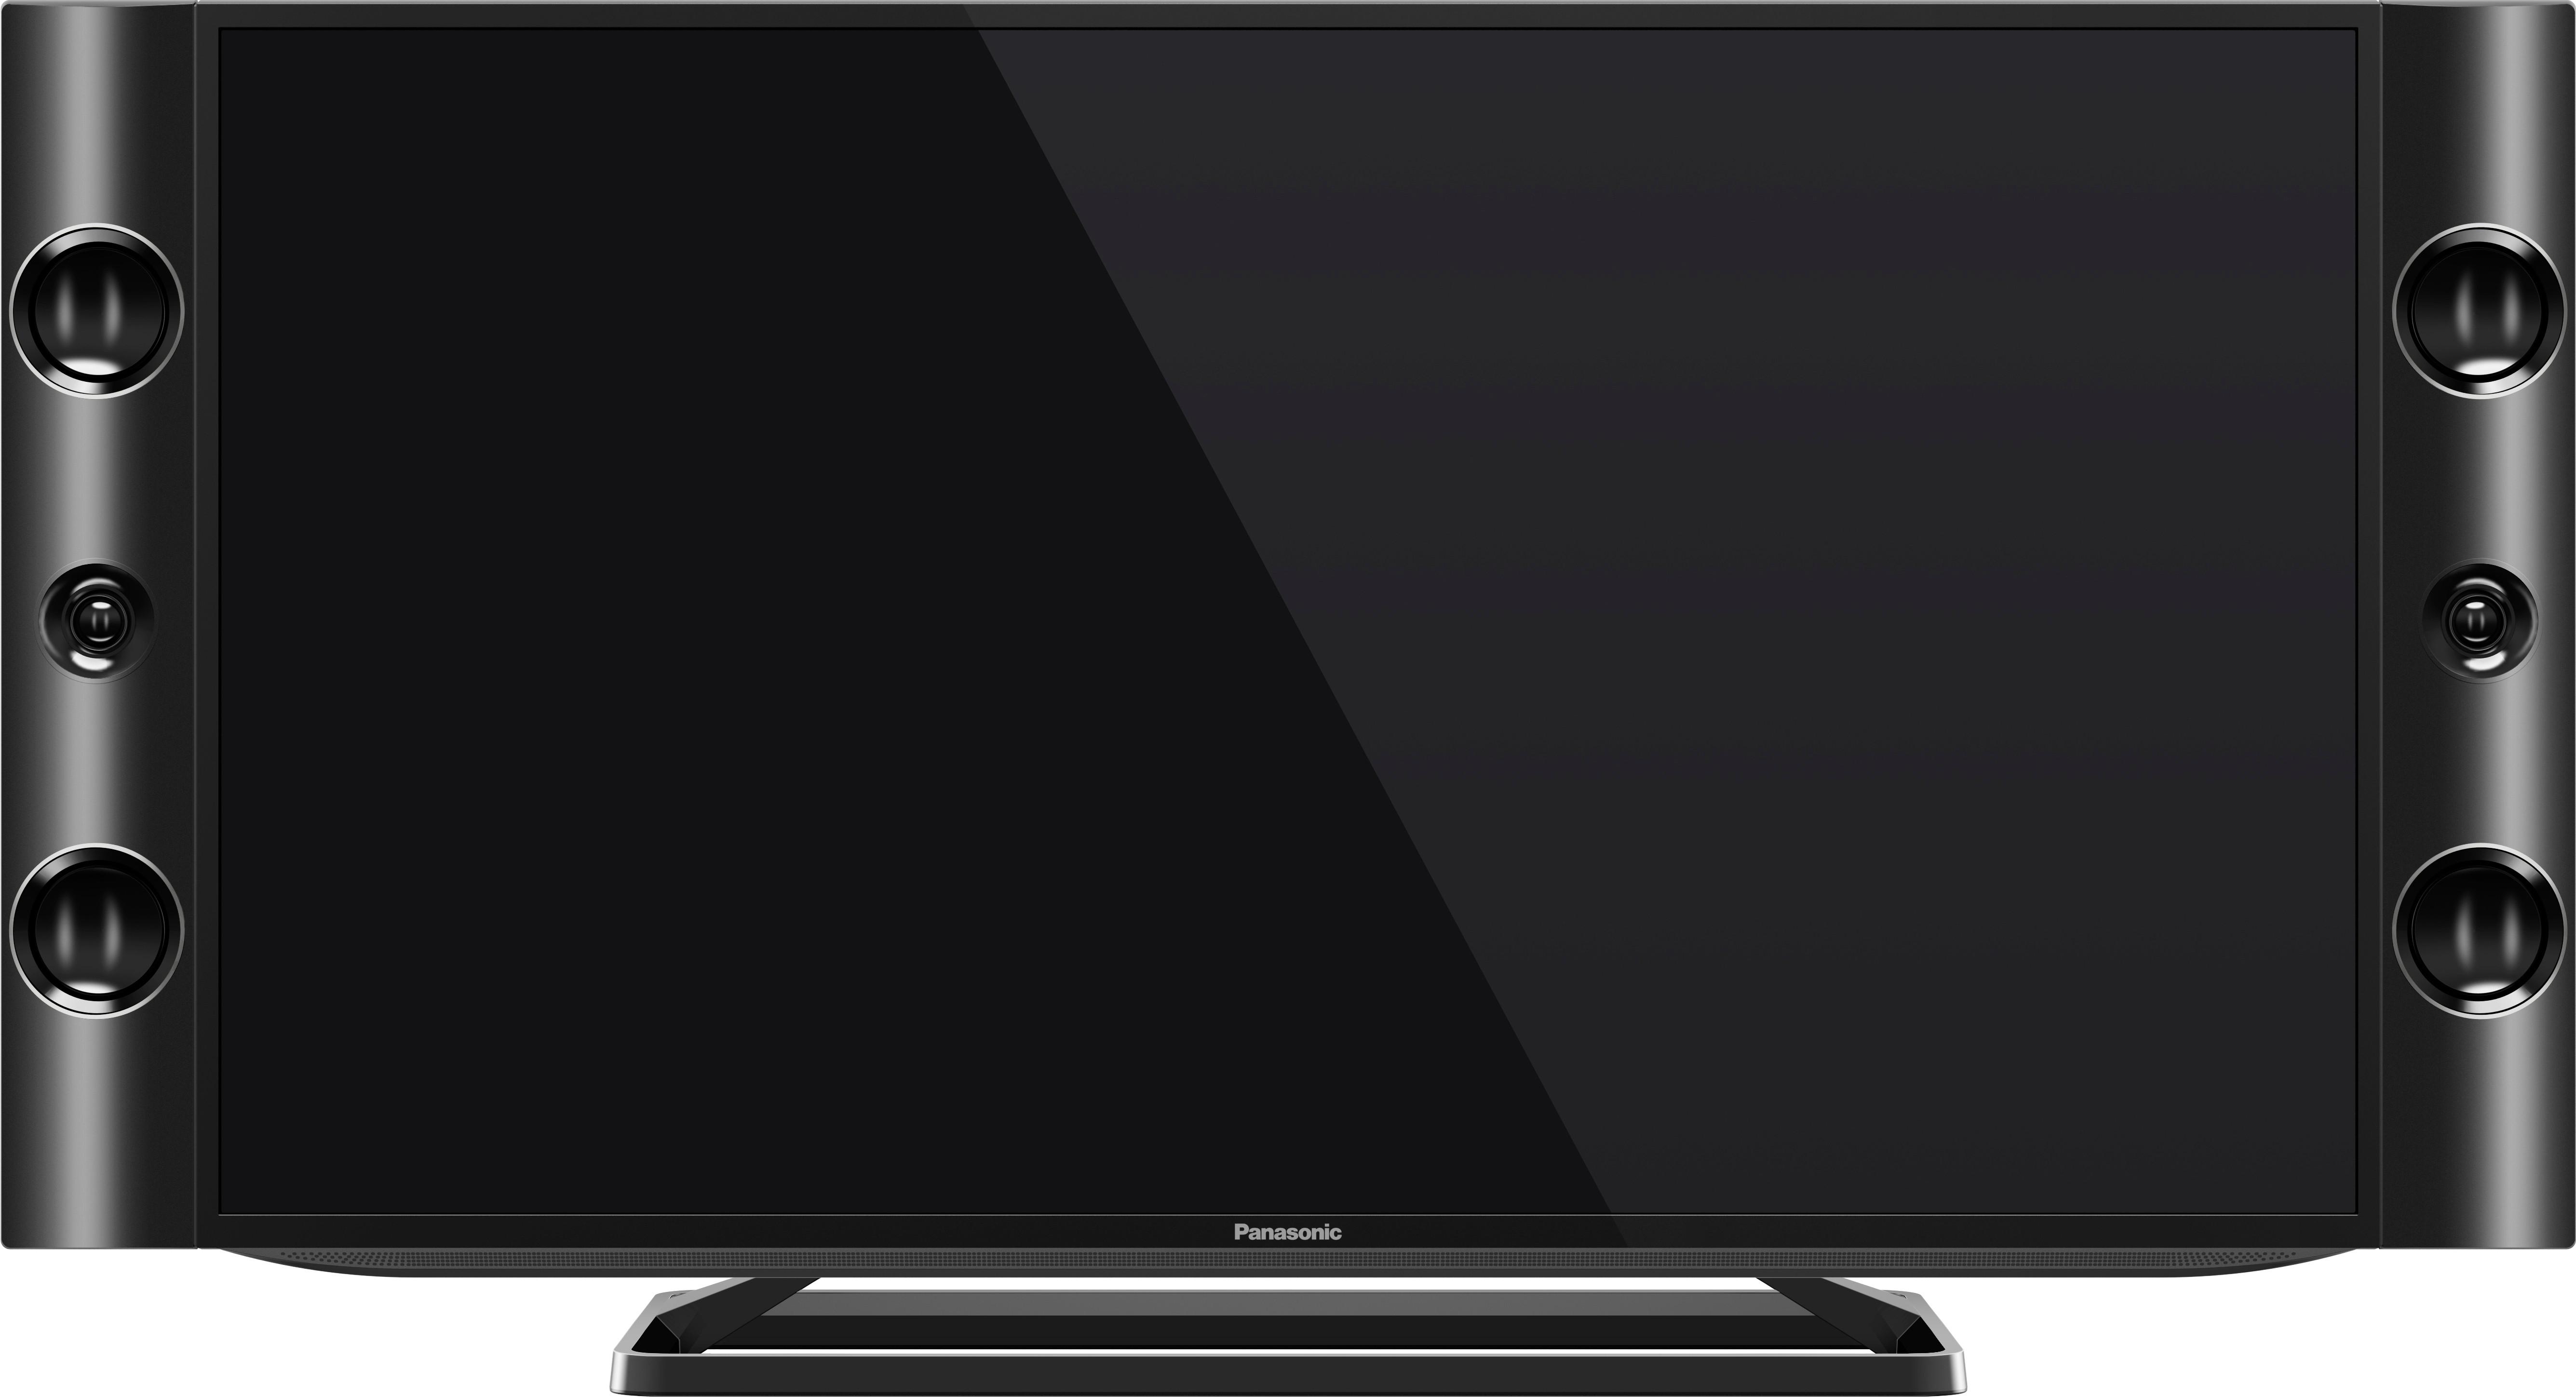 8bc240501 Panasonic 100cm (40) Full HD LED TV TV Price in Indian Cities ...